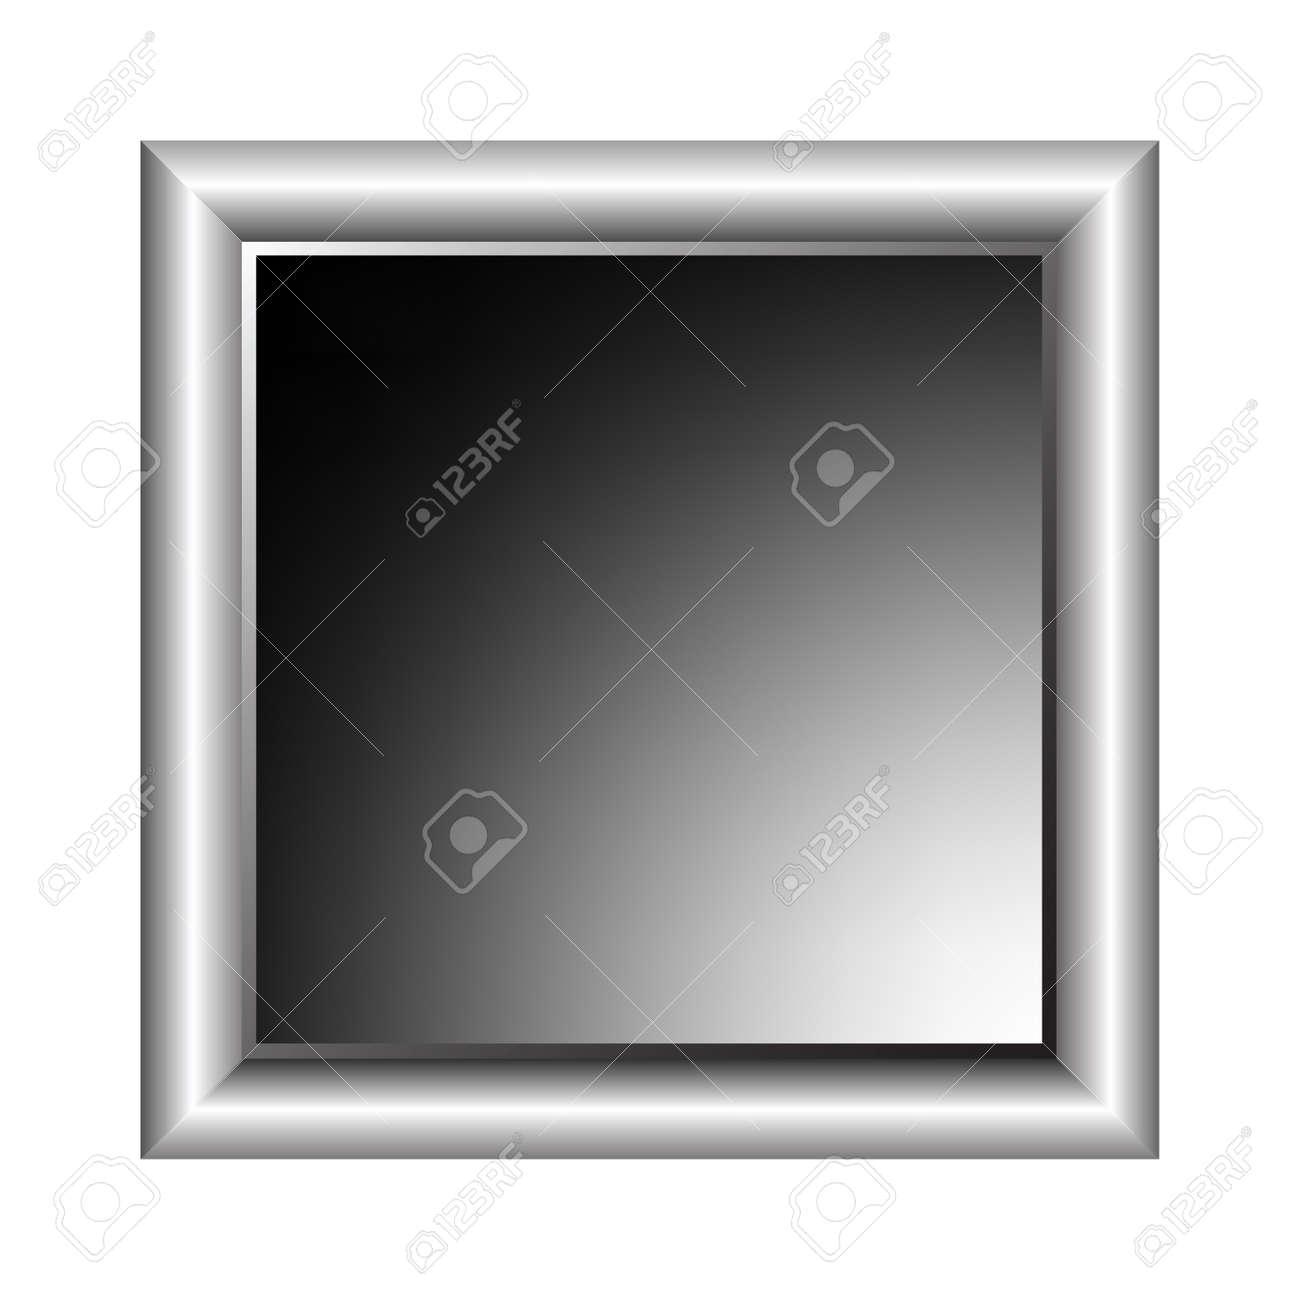 aluminium photo frame, vector art illustration; more photo frames in my gallery Stock Vector - 6159600